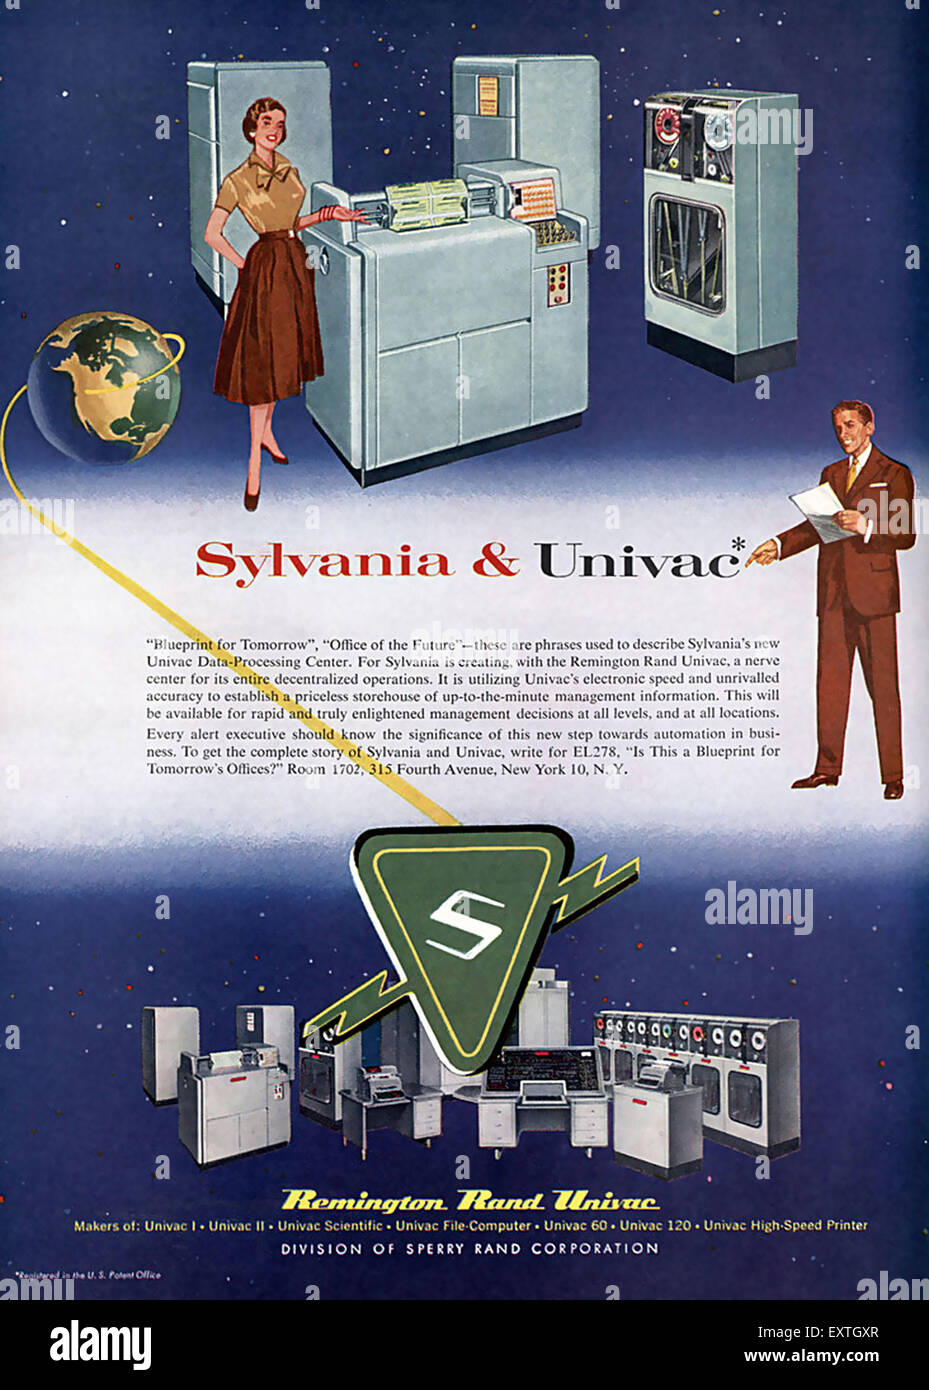 1950s USA Remington Rand Magazine Advert - Stock Image